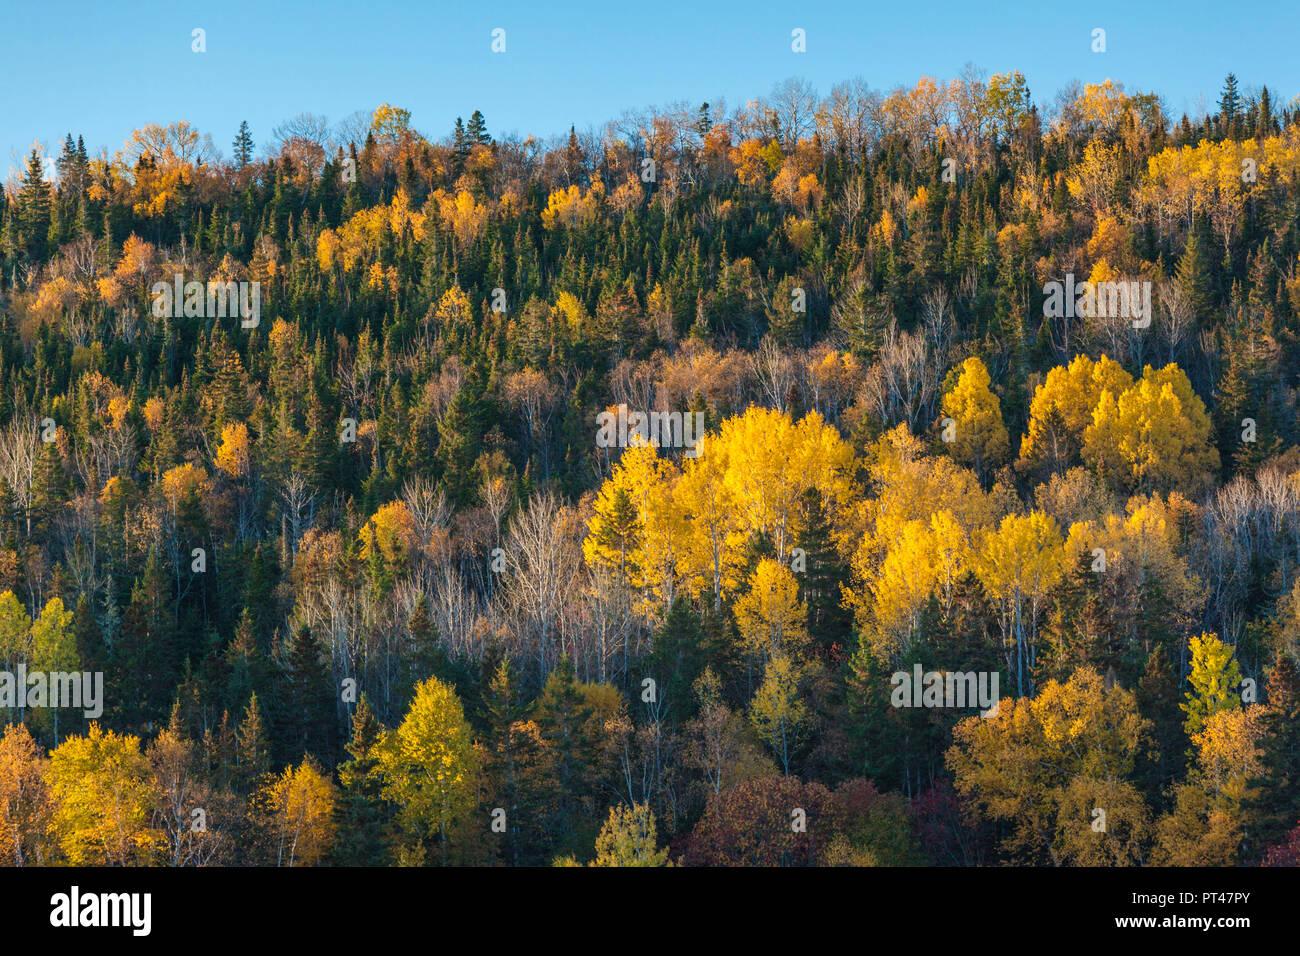 Canada, Quebec, Gaspe Peninsula, Gaspe, autumn, trees - Stock Image